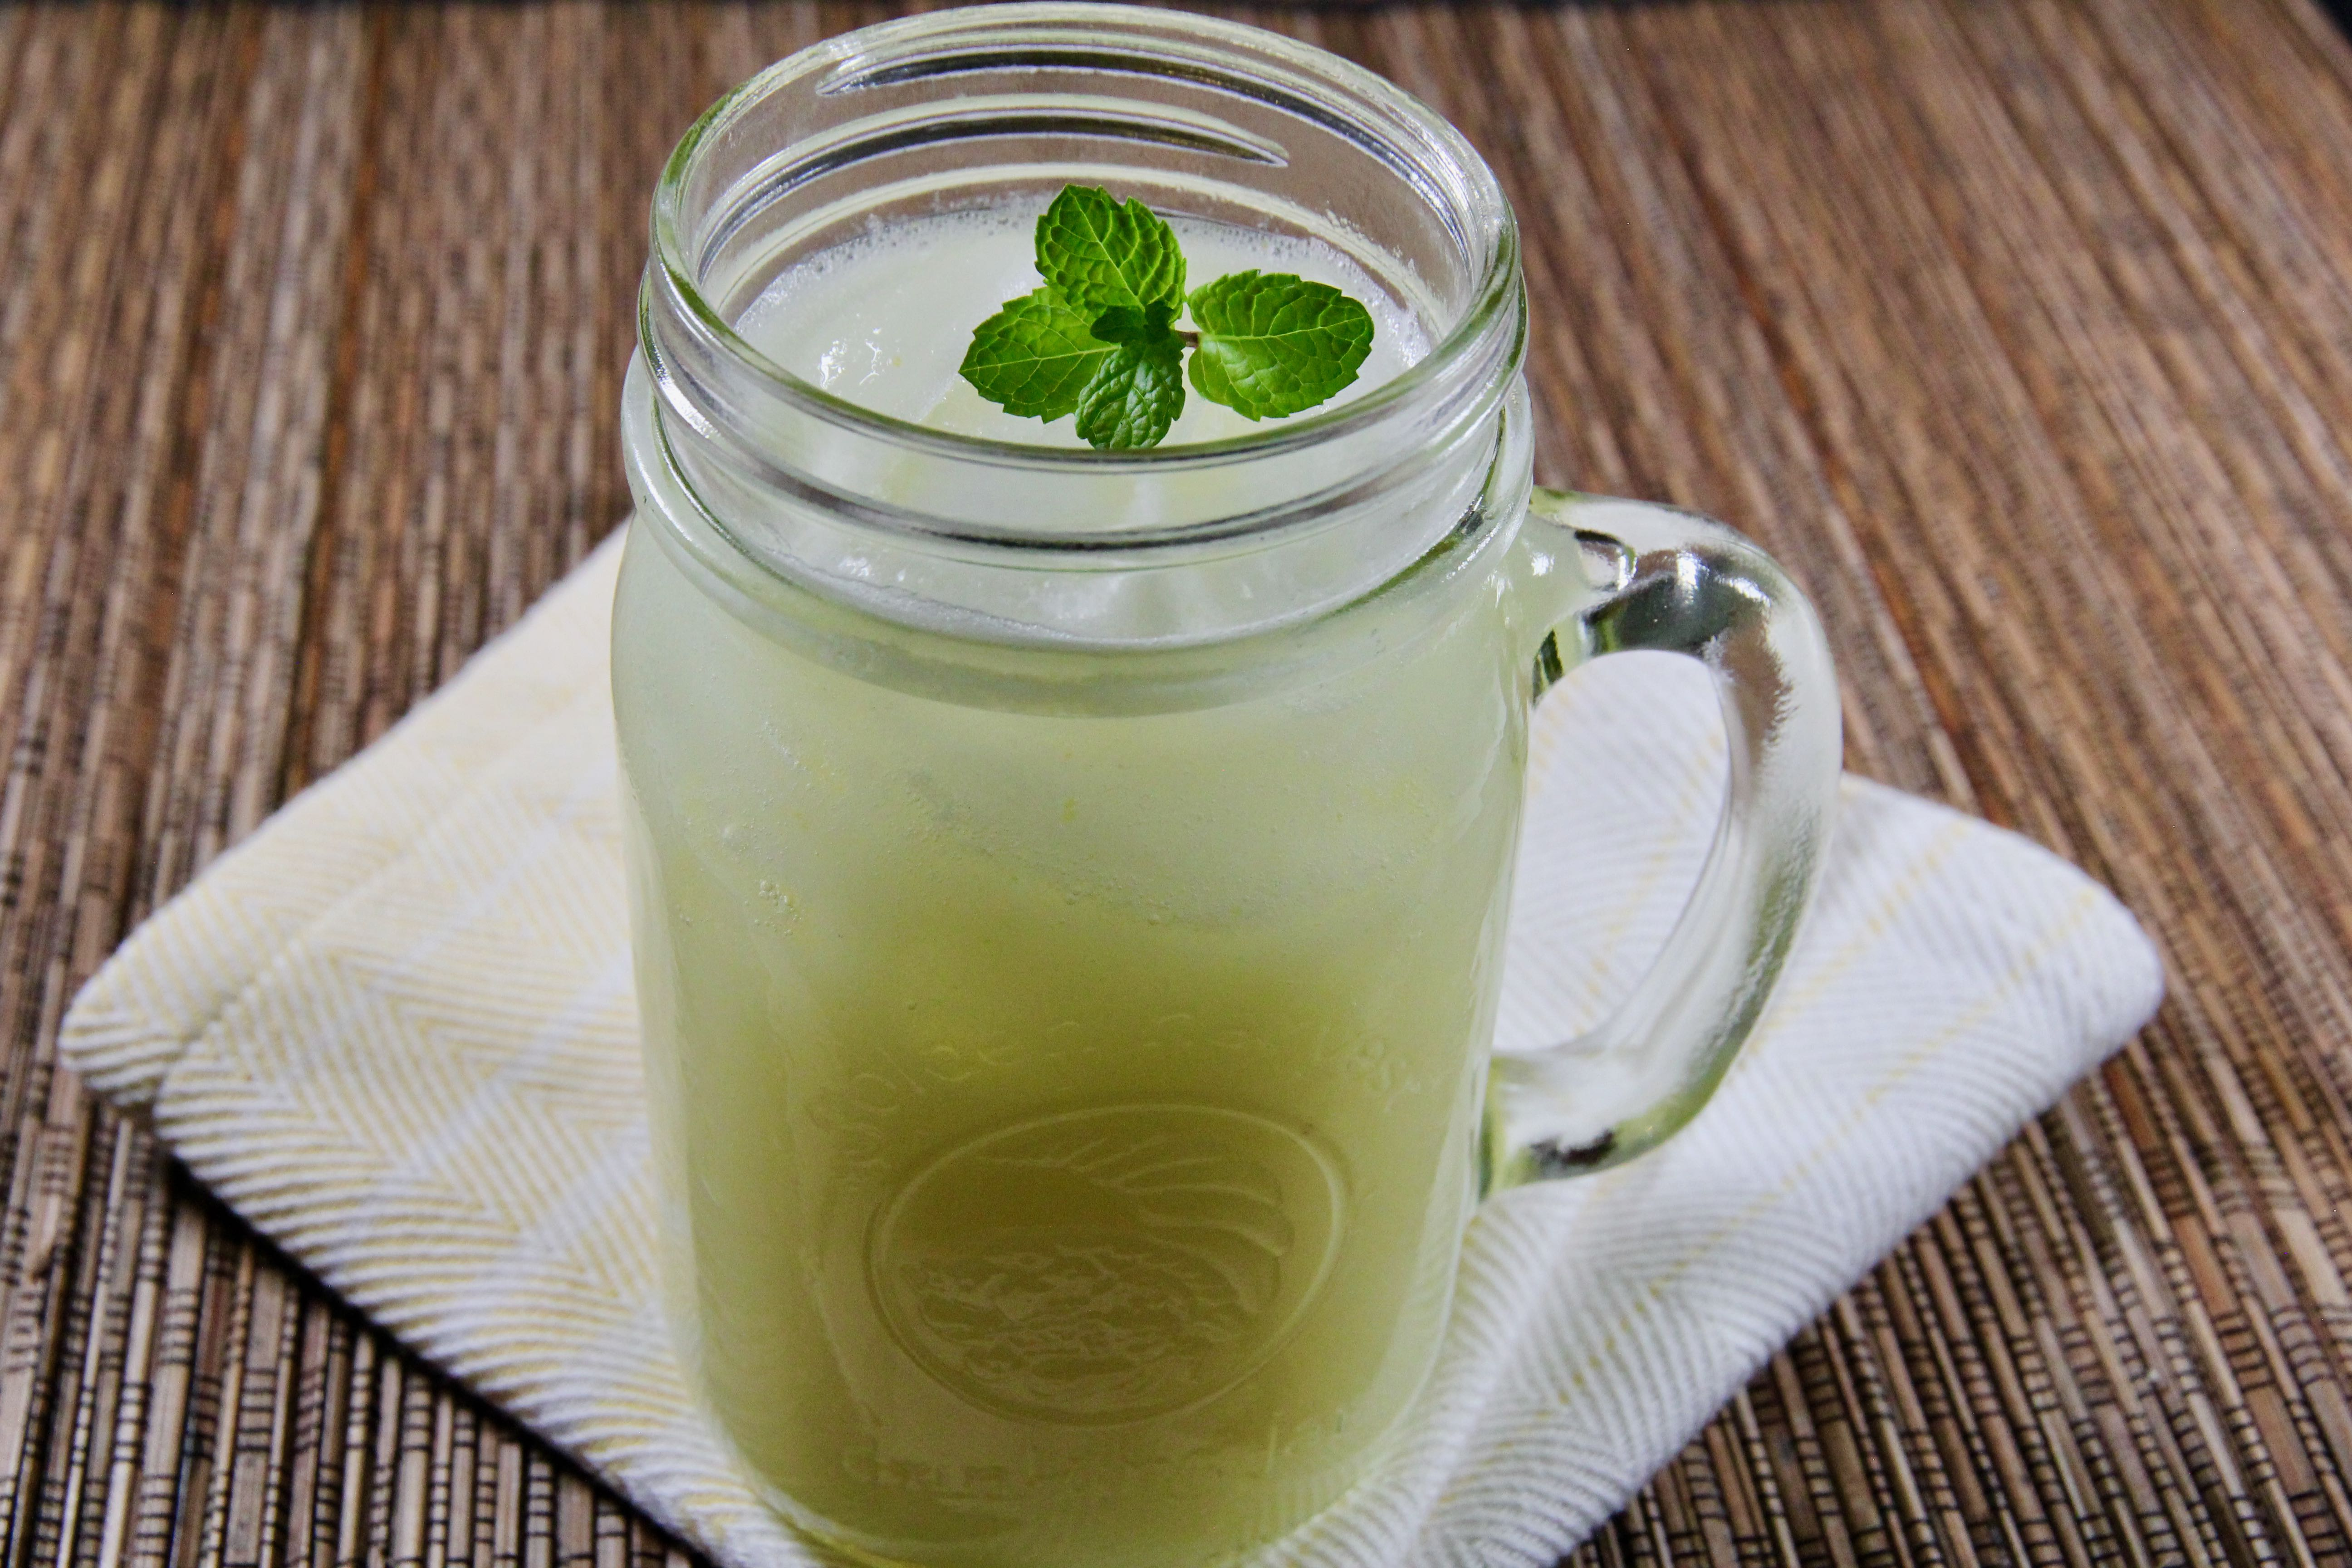 Southern-Style Vanilla Lemonade